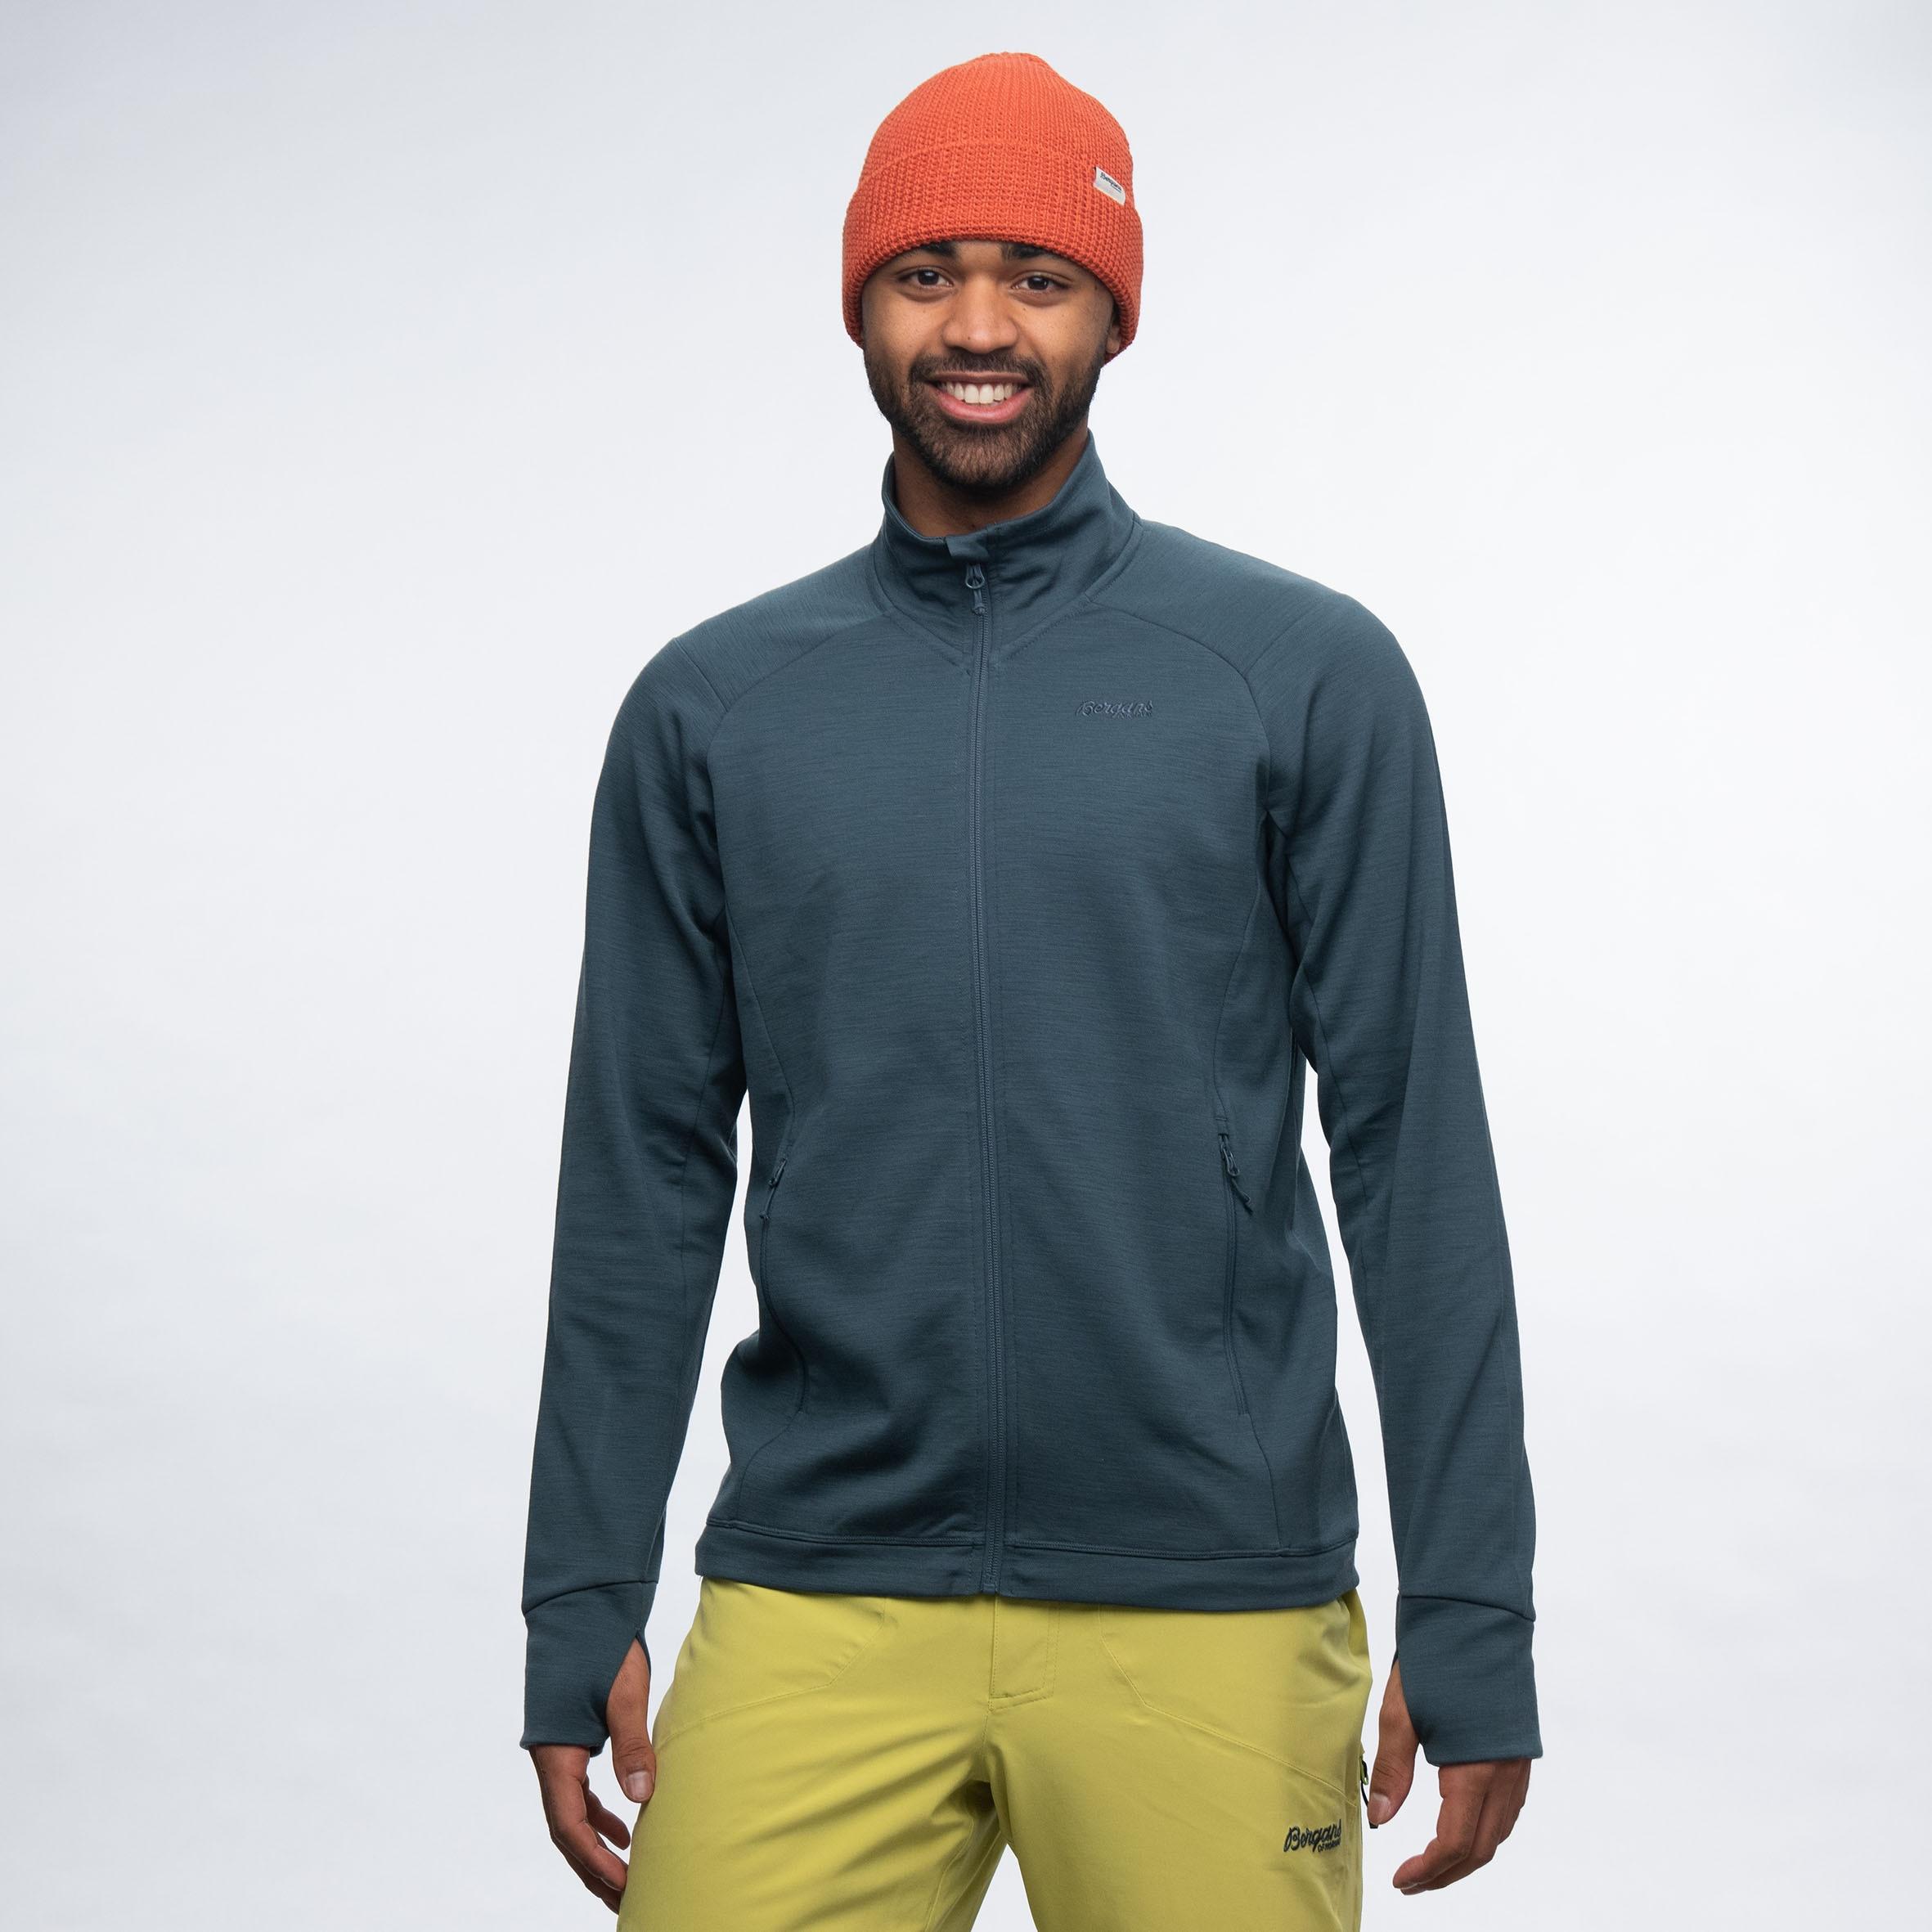 Ulstein Wool Jacket